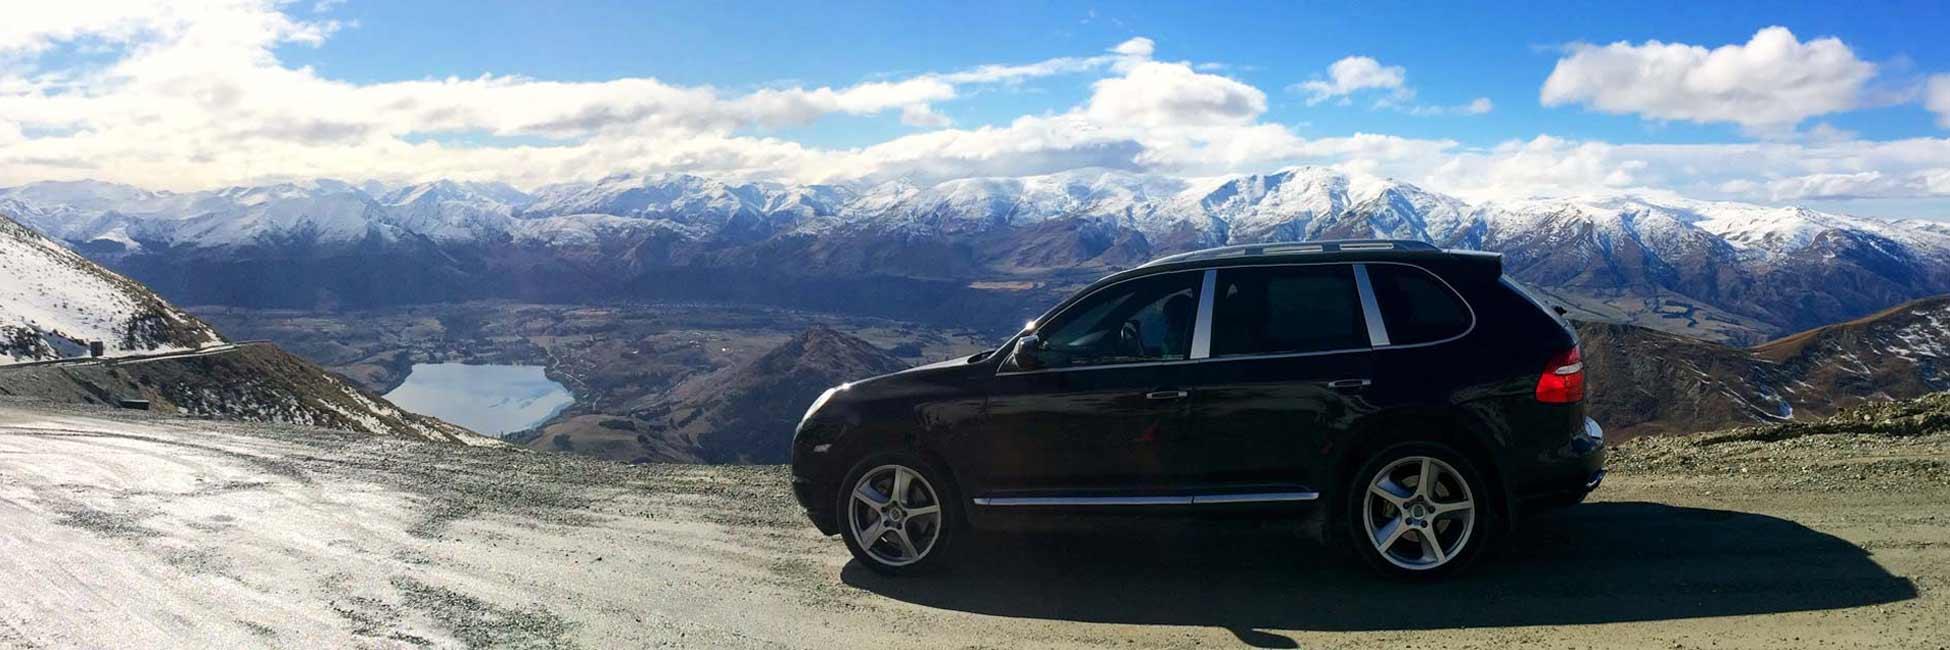 Queenstown Luxury Car Rental  Luxury Car Rental New Zealand